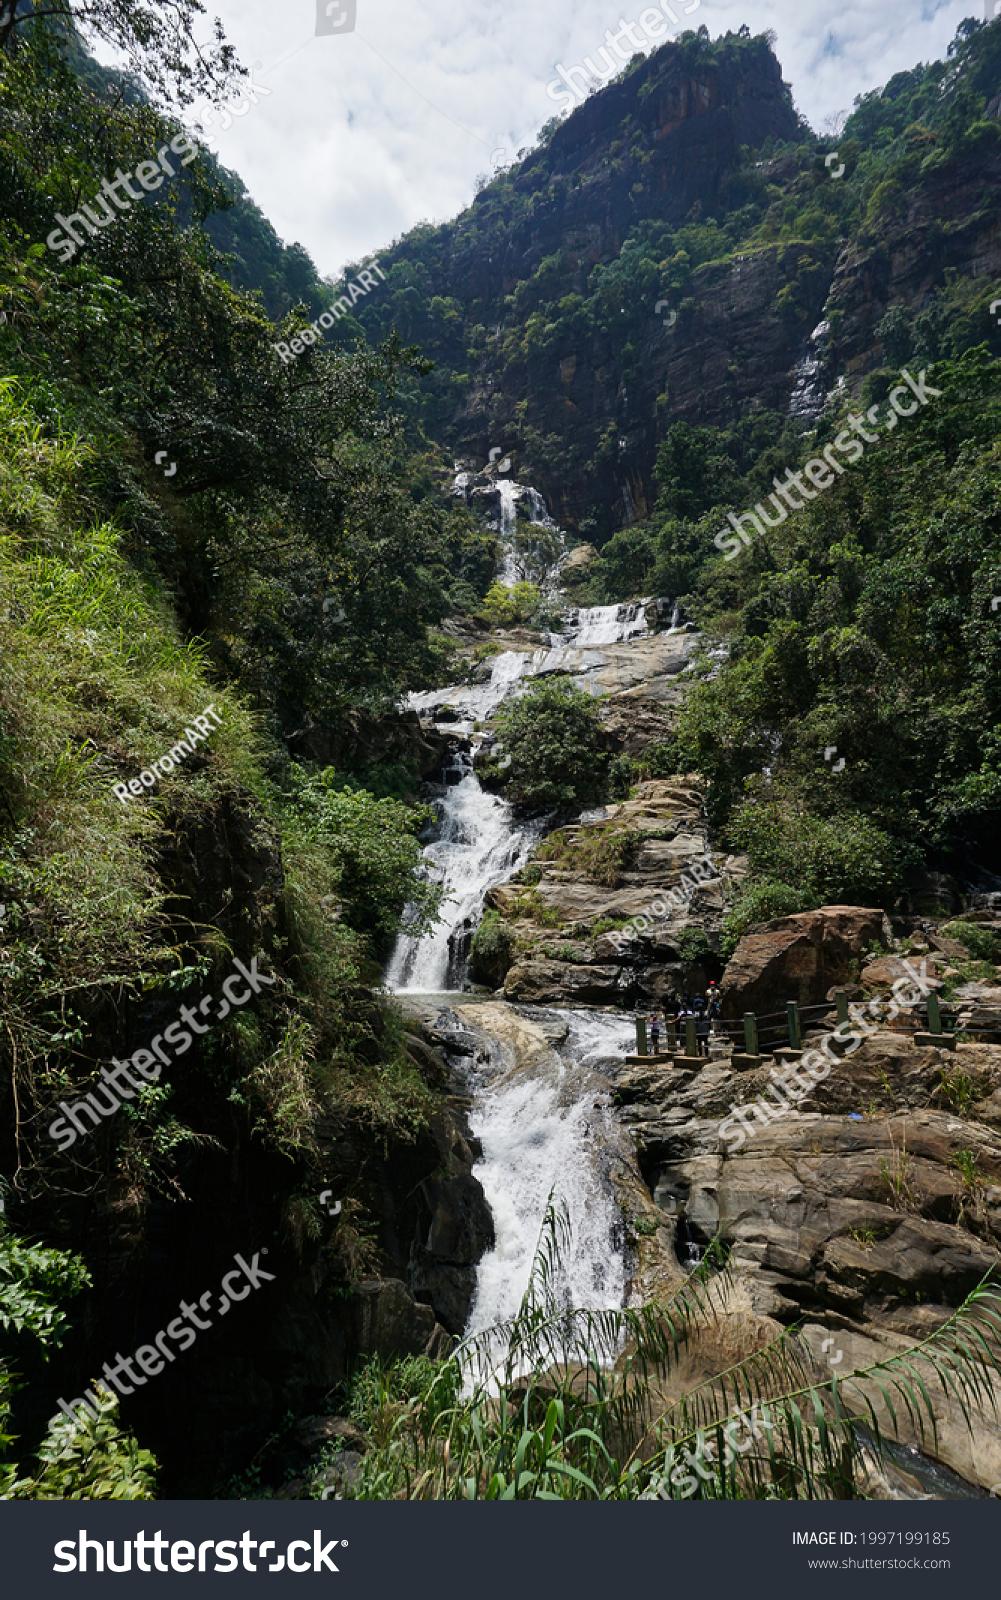 stock-photo-ravana-falls-in-ella-sri-lan